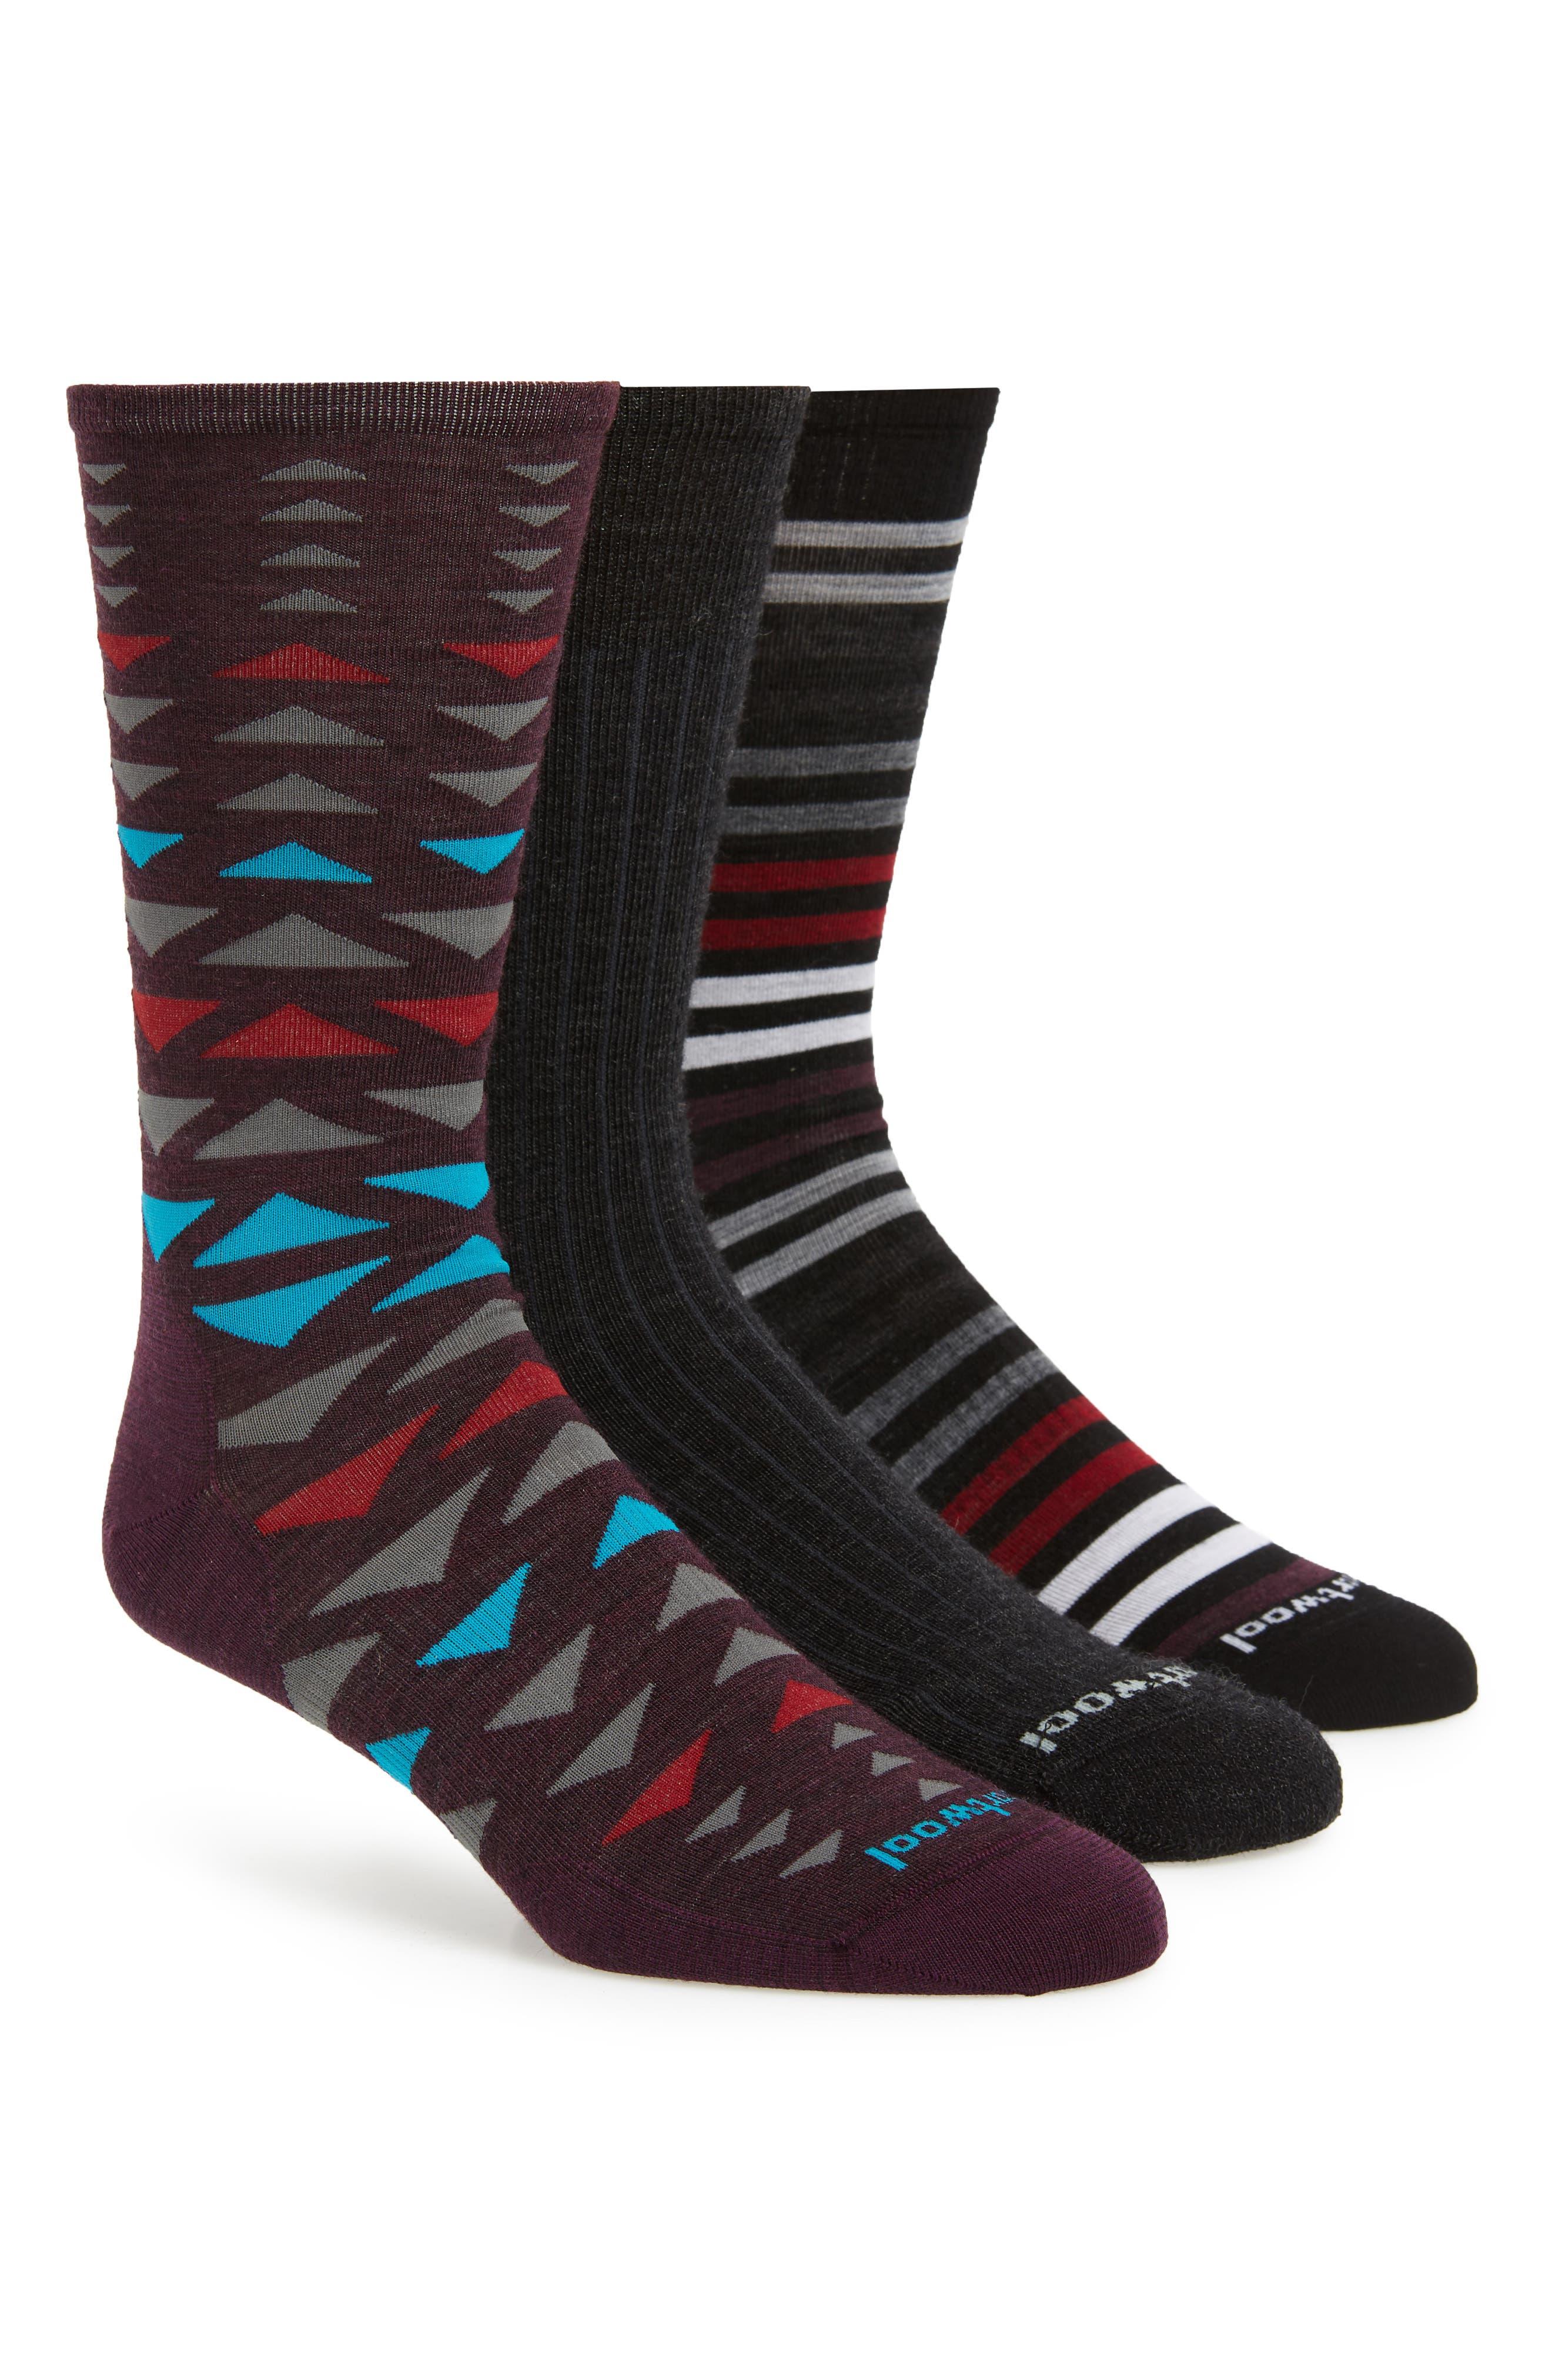 Trio 3-Pack Socks,                         Main,                         color, CHARCOAL HEATHER/ TIBETAN RED